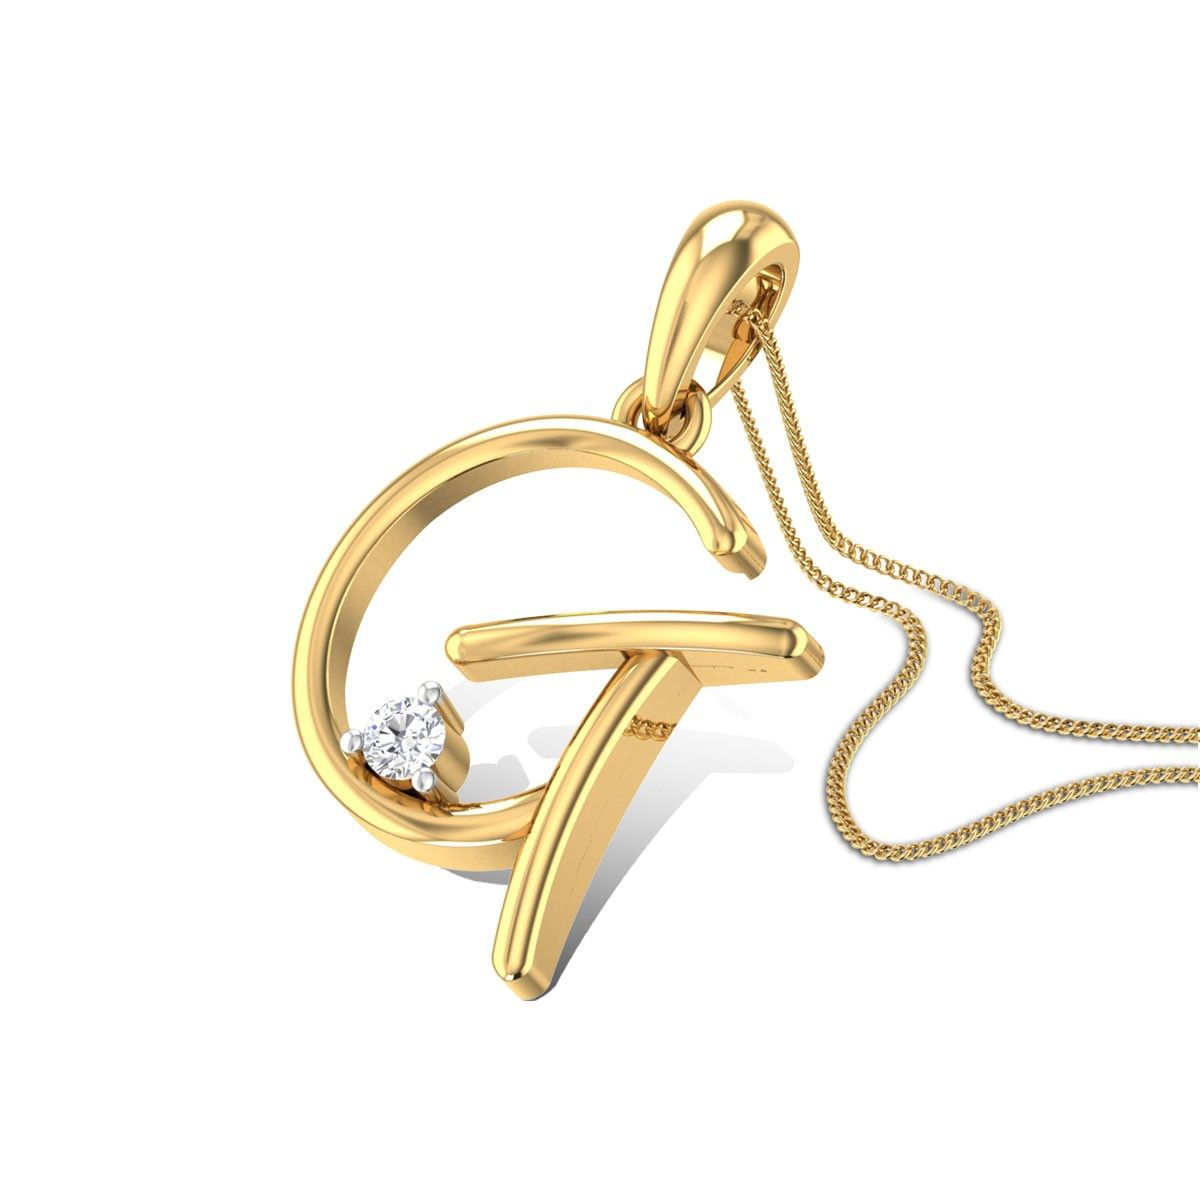 Alphabet pendants in goldg alphabet locket design gold pendant alphabet pendants in goldg alphabet locket design gold pendant design for alphabets aloadofball Image collections